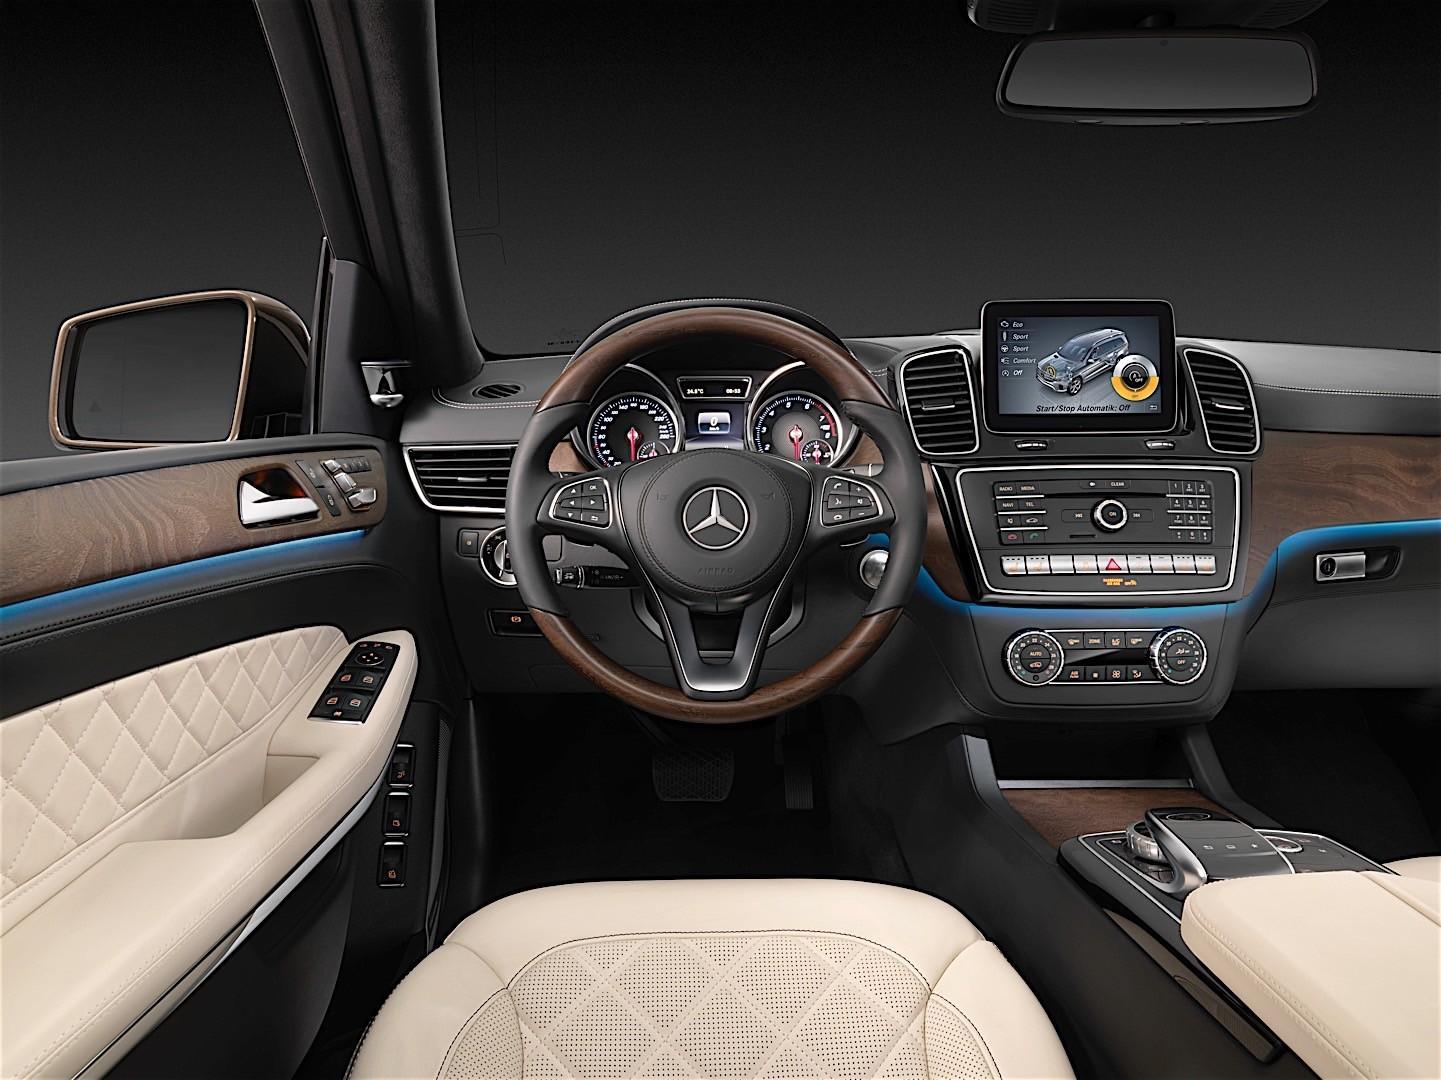 Exceptional Prestige Motors Dealership In New Jersey Mercedes Benz GLS Class Mercedes  Benz GLS Class ...